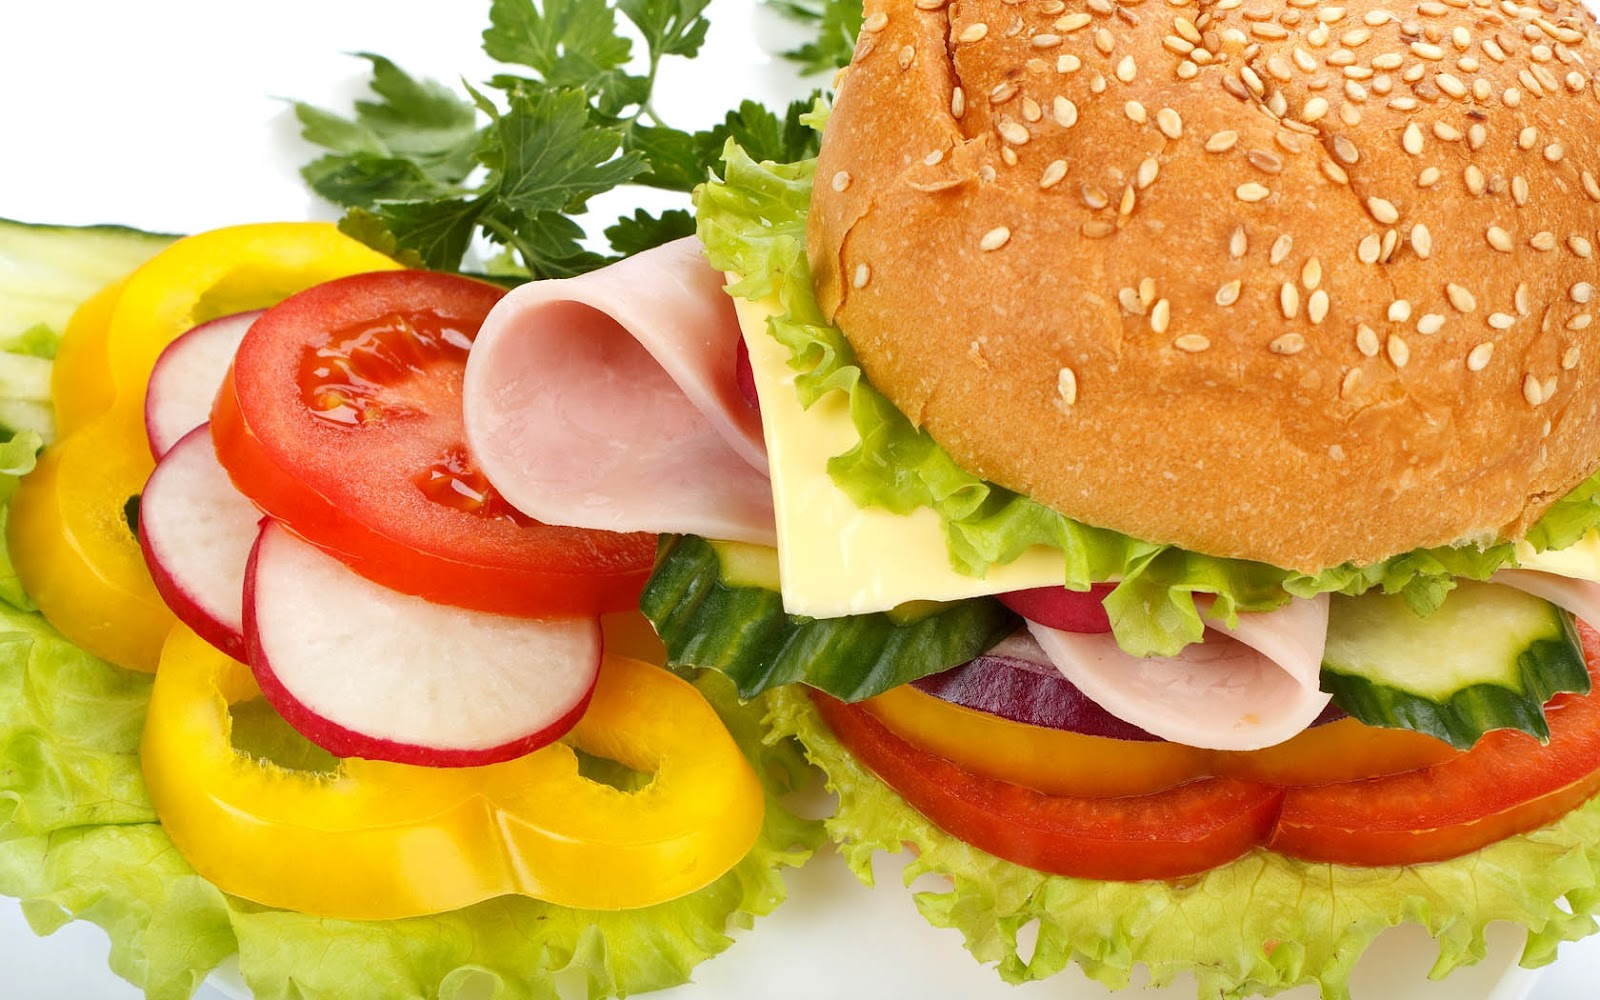 http://1.bp.blogspot.com/-x8YcyGFin3g/UEUJC9O7lNI/AAAAAAAAF-o/j2tUAEz0FdI/s1600/hd-broodje-gezond-achtergrond-met-broodje-ham-kaas-komkommer-tomaat-sla-en-paprika-hd-eten-wallpaper.jpg